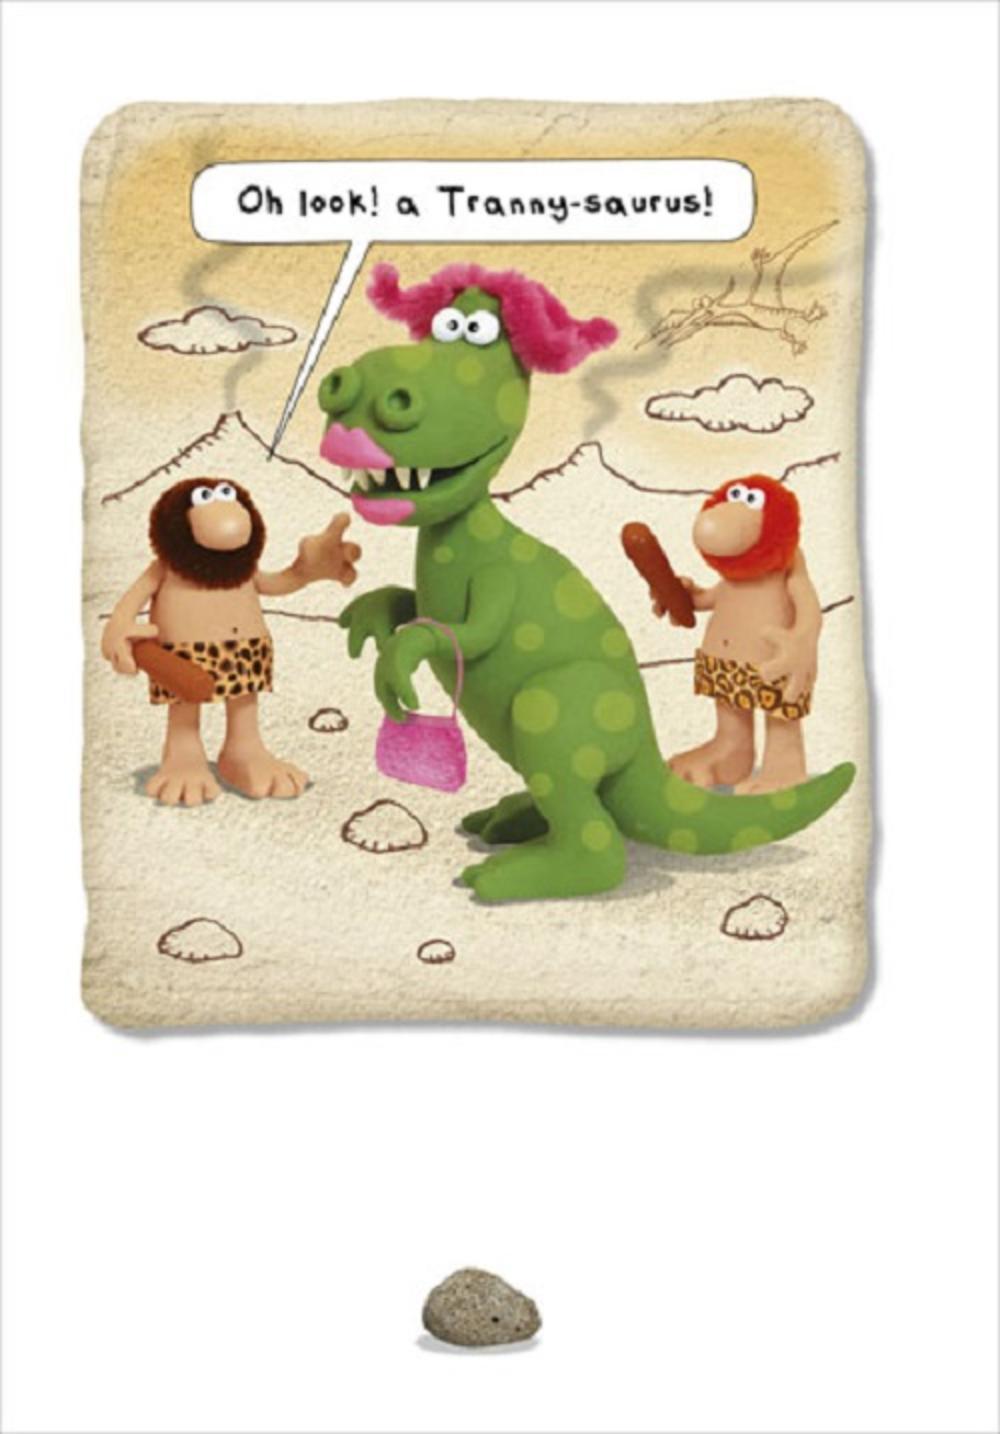 Tranny-saurus! Funny Jurassic Street Birthday Card